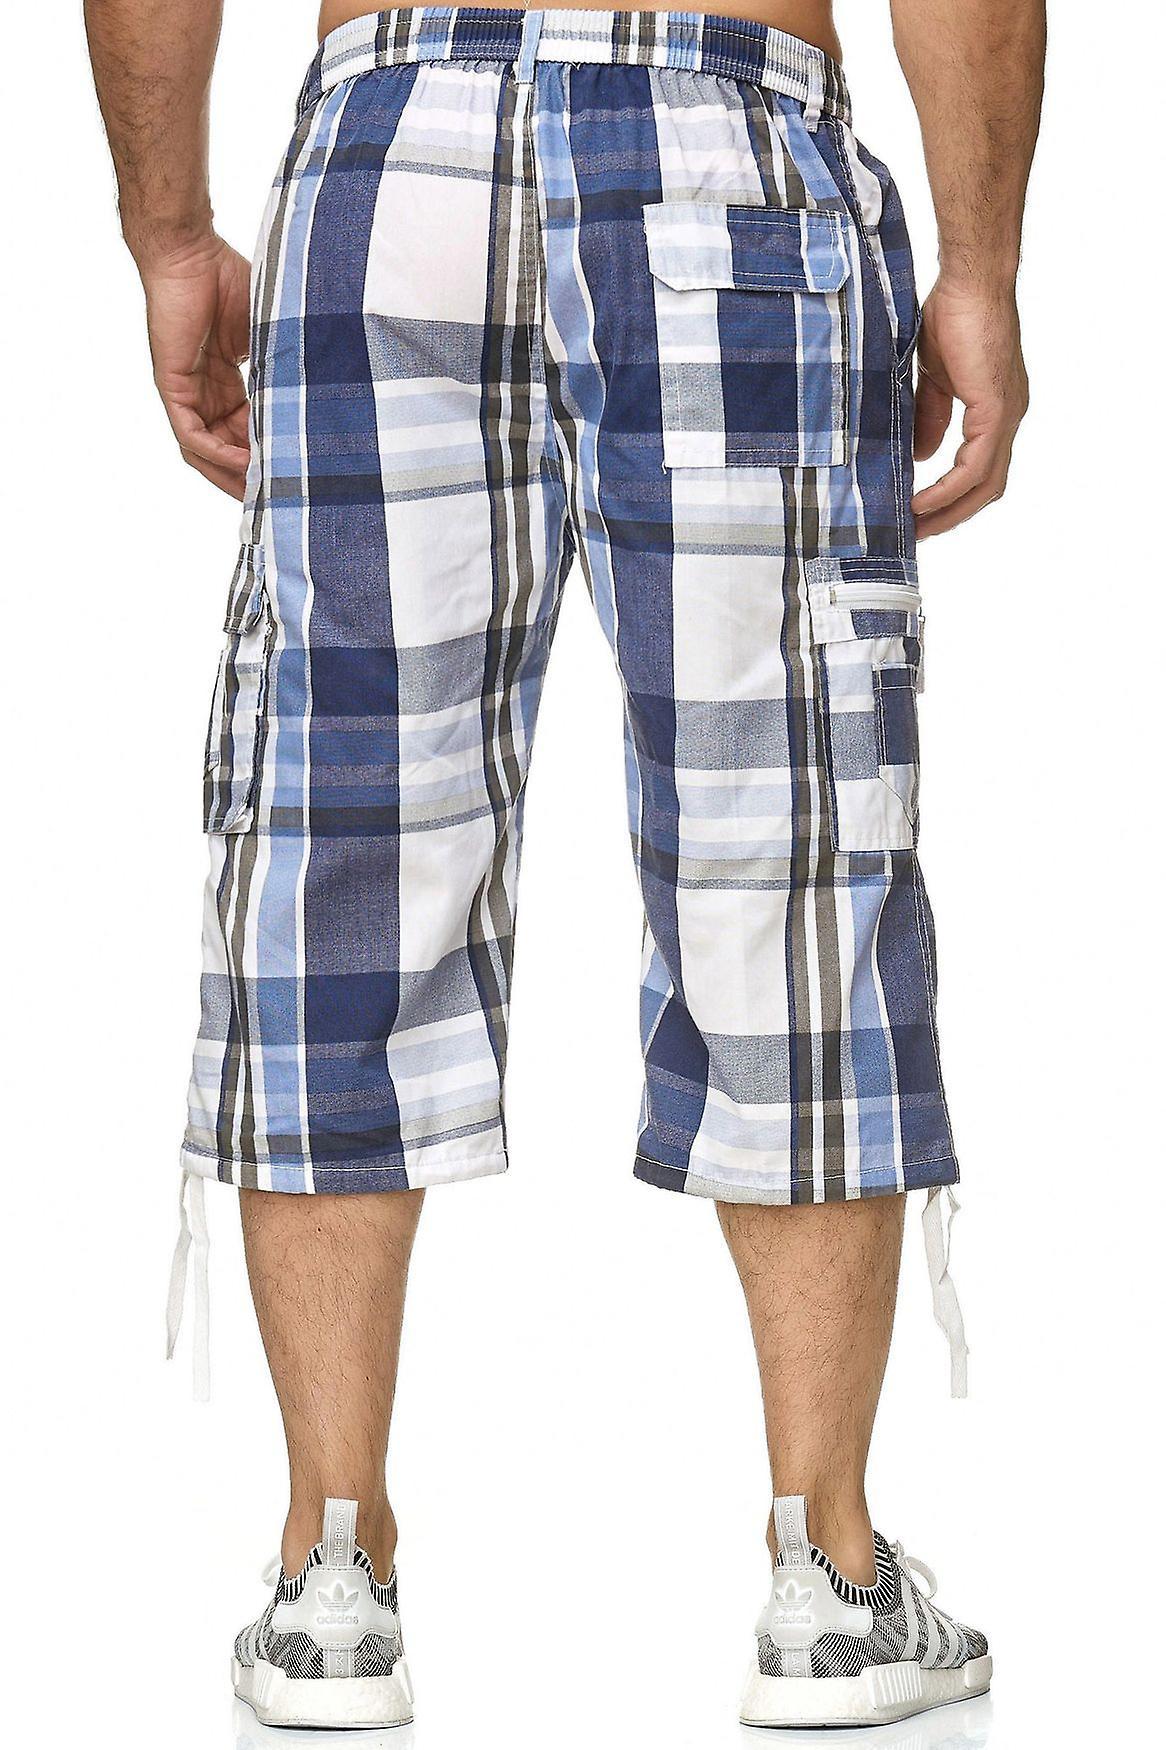 f7df20b1e0486d Herren Bermuda Freizeit Shorts Sommer Karo-Shorts Cargo Capri 3/4 Taschen